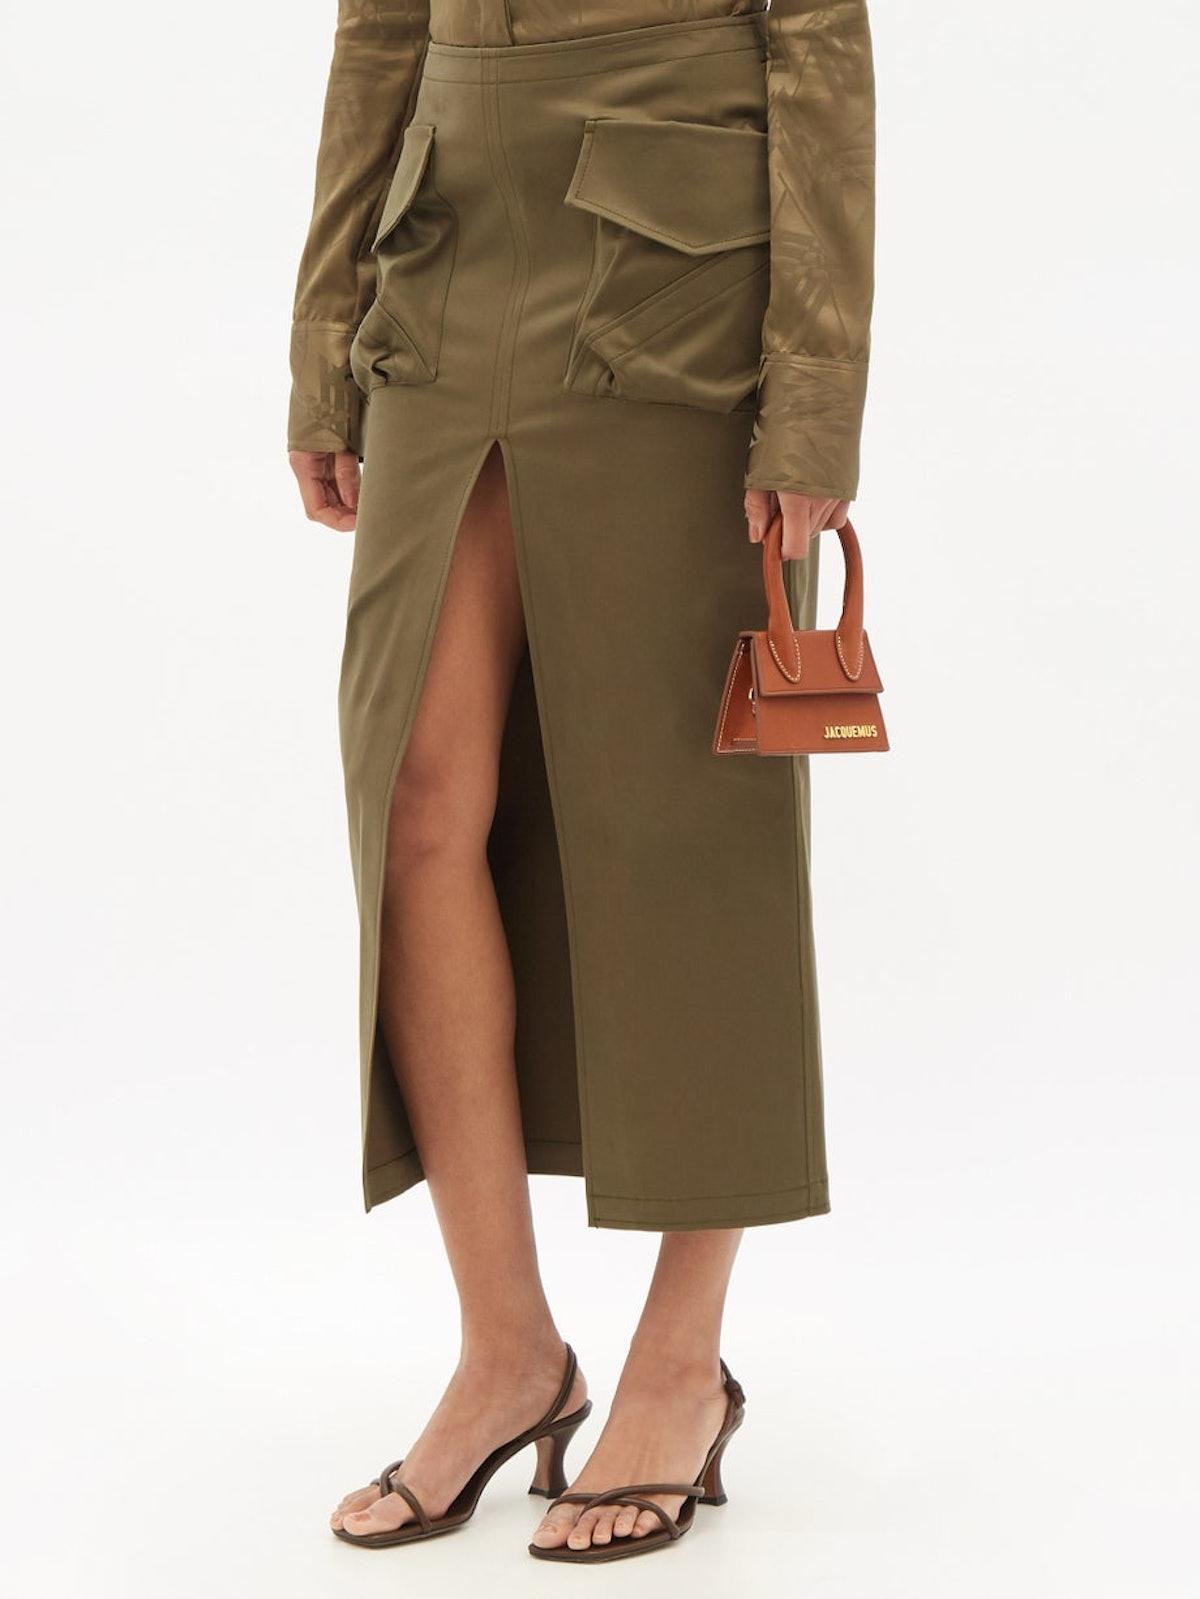 The Attico Patch-Pocket Split Cotton-Blend Twill Skirt